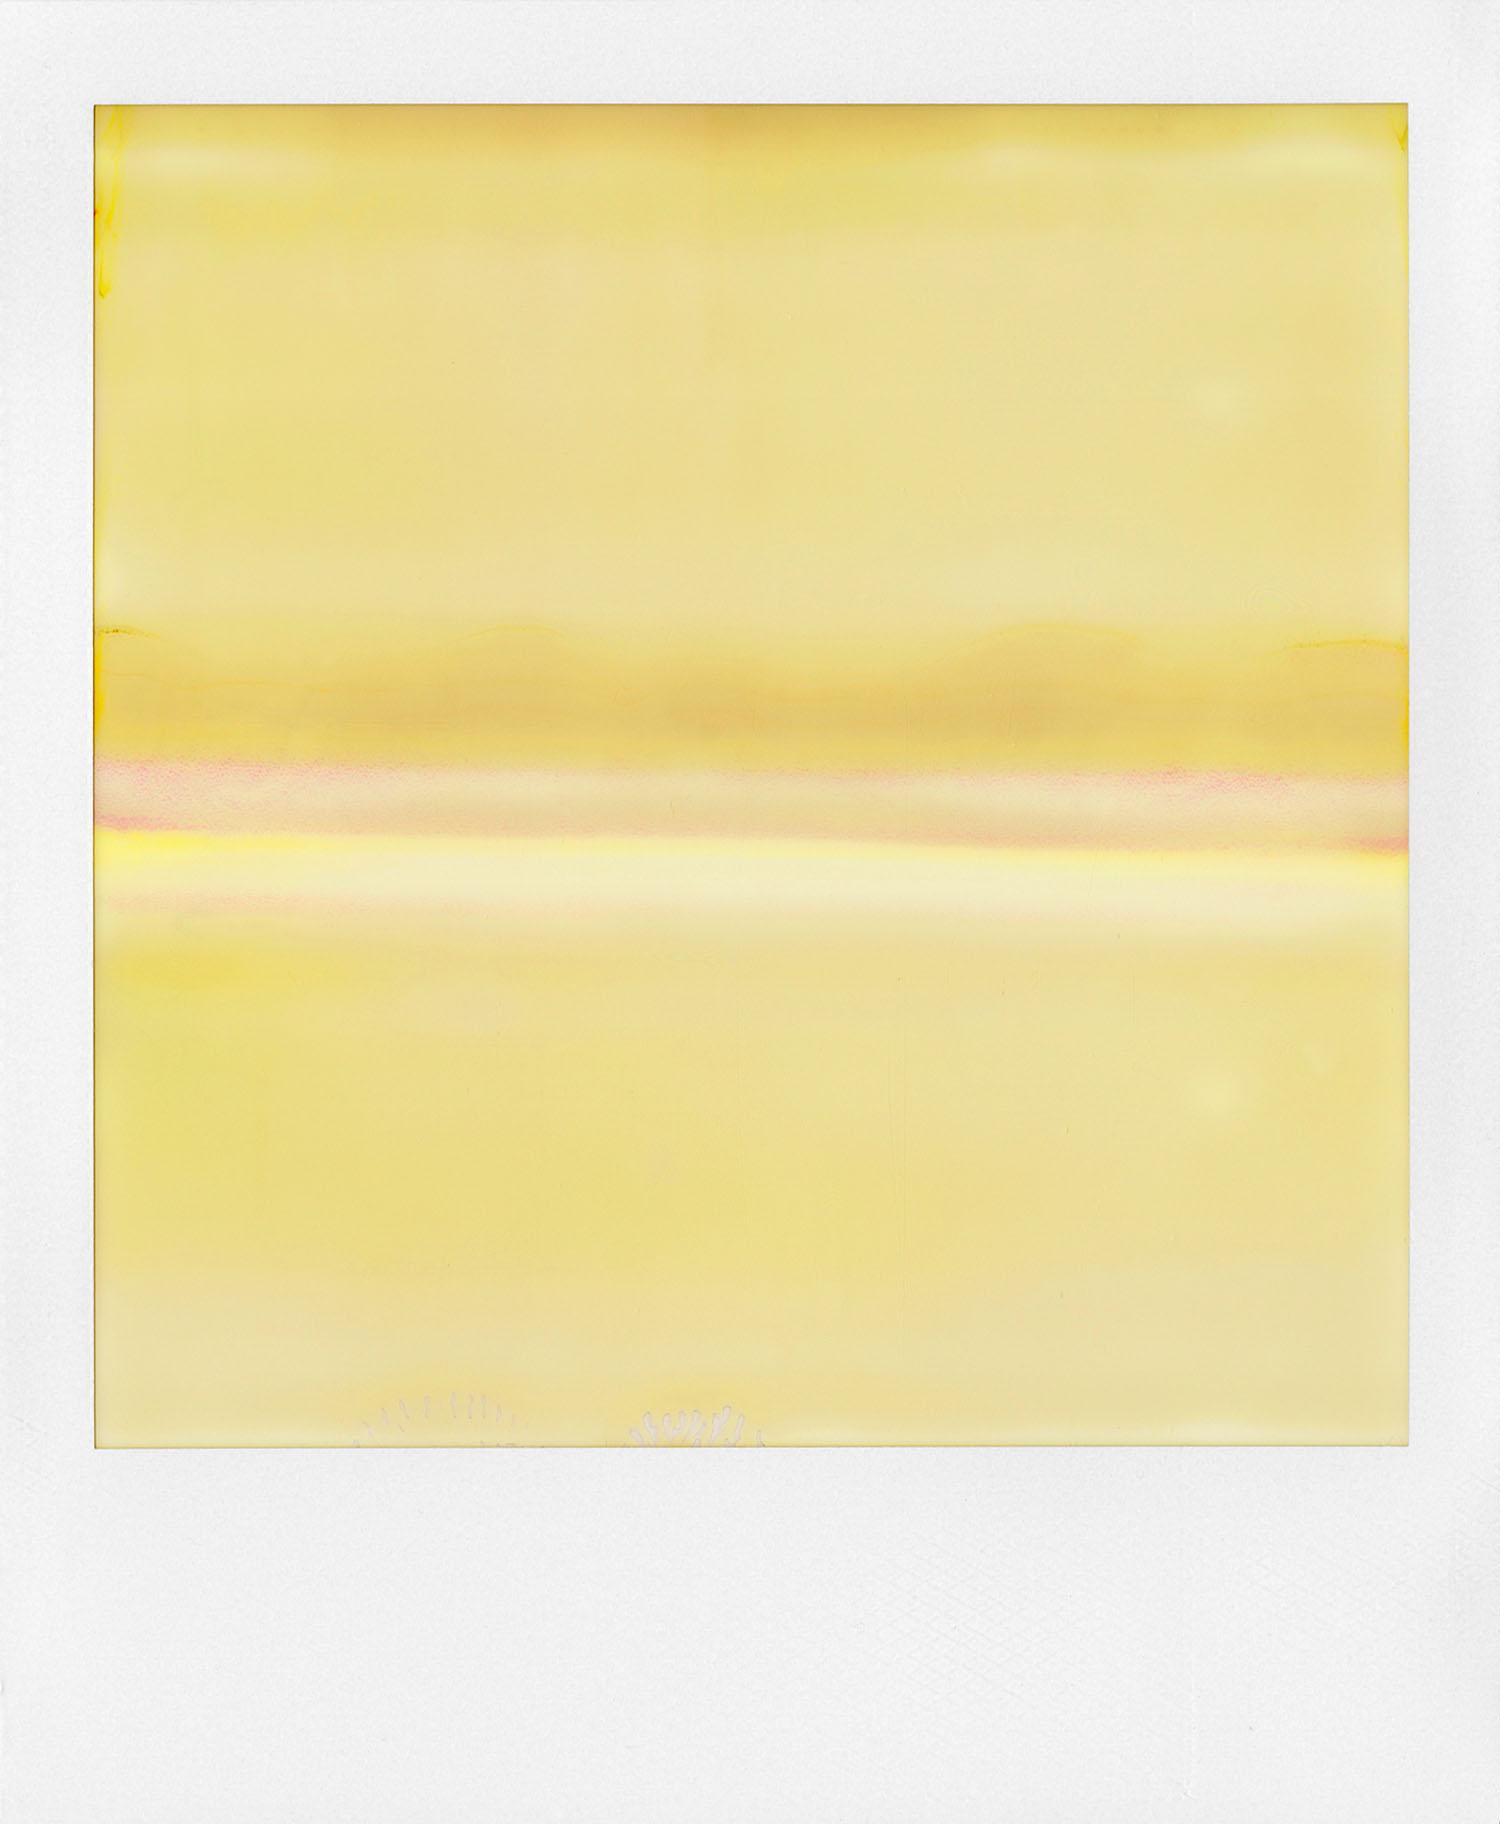 Ruined Polaroid #38 (2011)